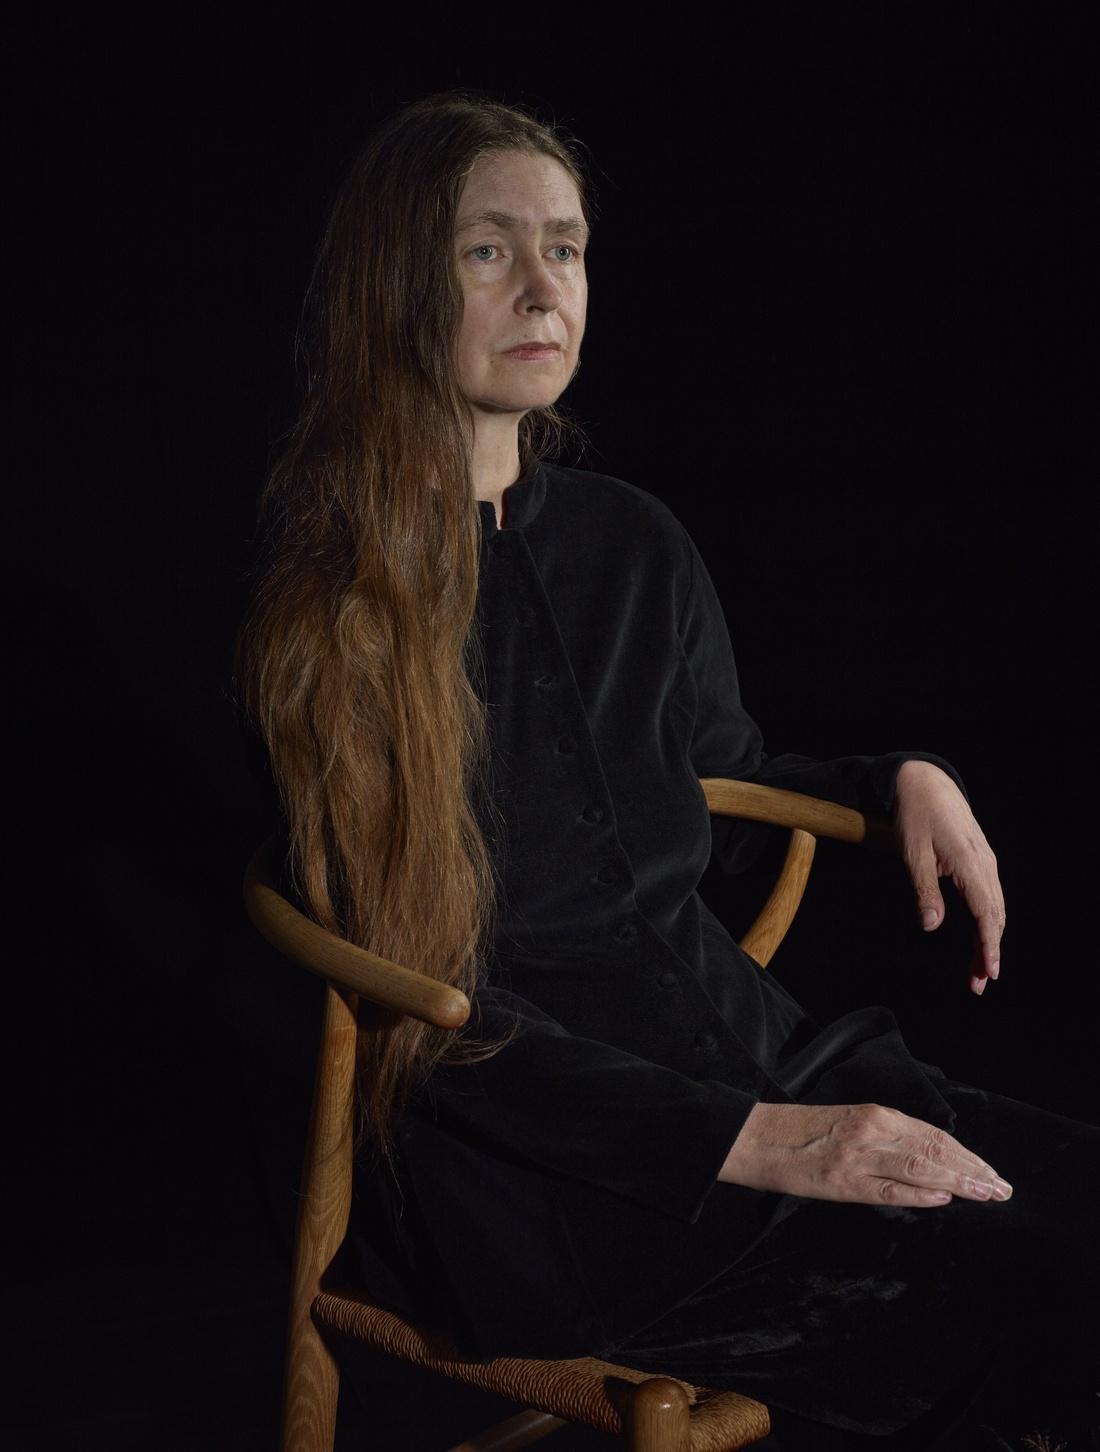 Catherine Opie, Celia, 2017. © Catherine Opie. Courtesy of Regen Projects, Los Angeles and Thomas Dane Gallery, London.